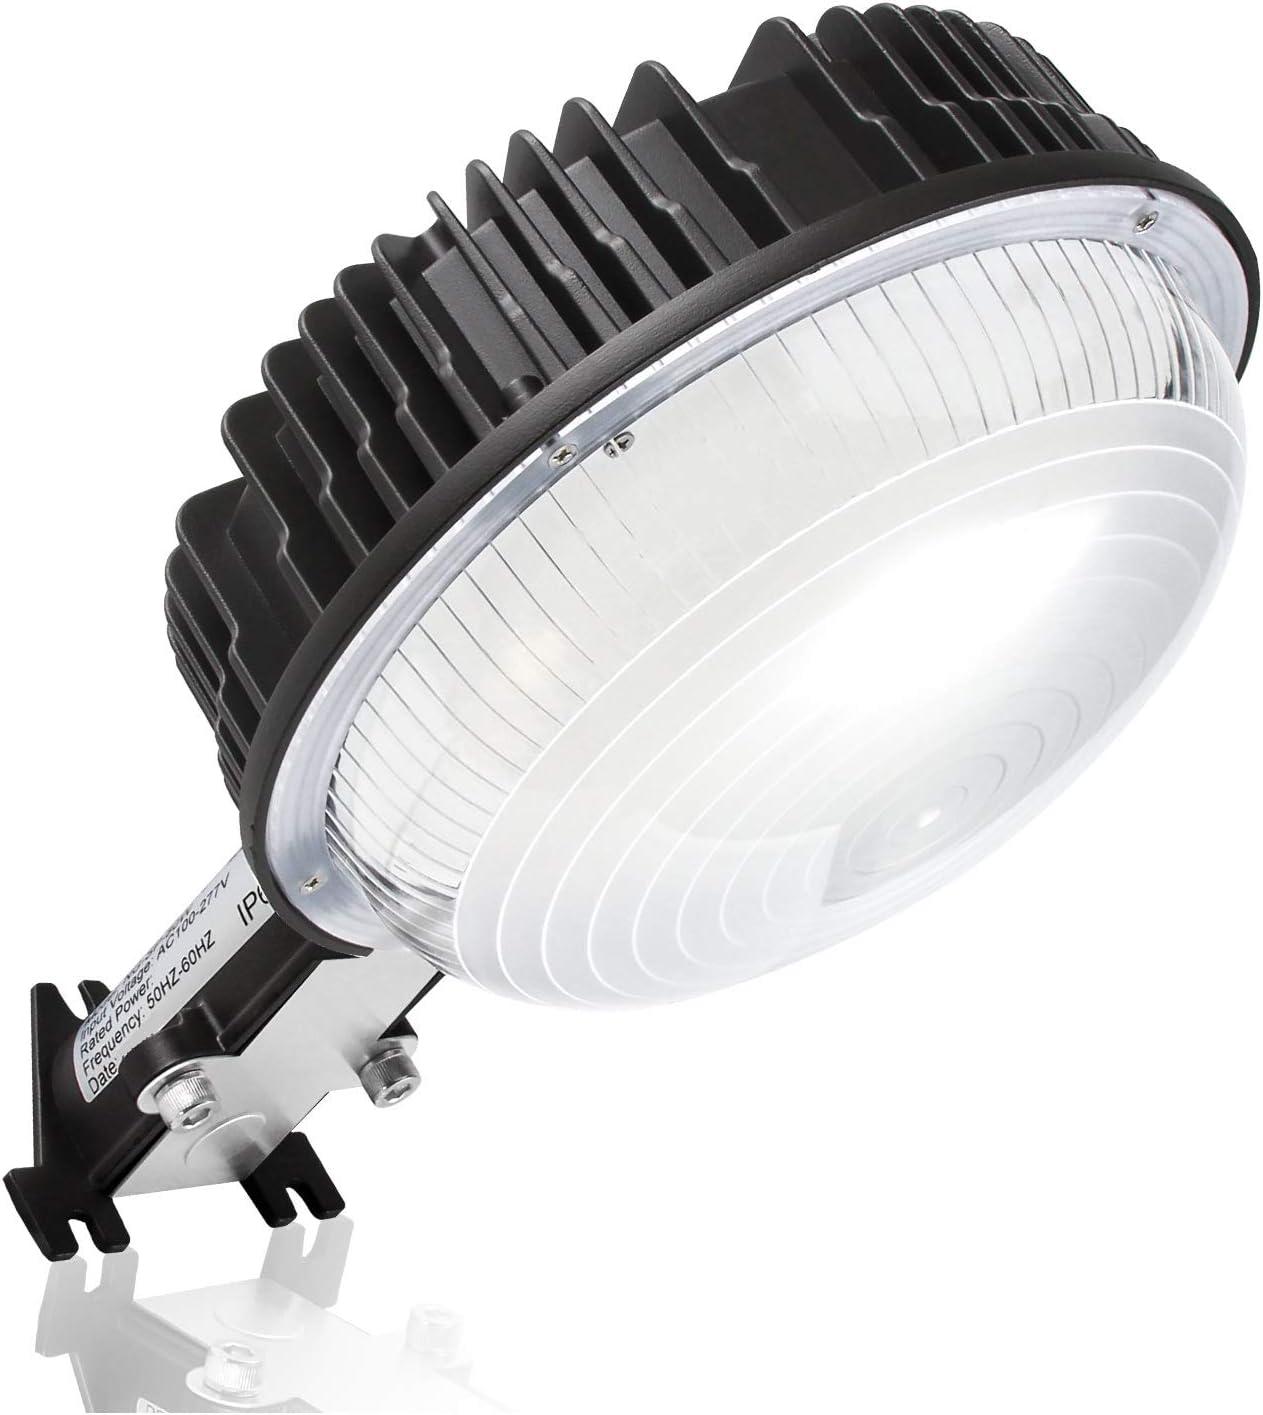 FOGGY 20 DIODI LED LEDS BIANCHI 3mm WHITE LUCE DIFFUSA DIFFUSED